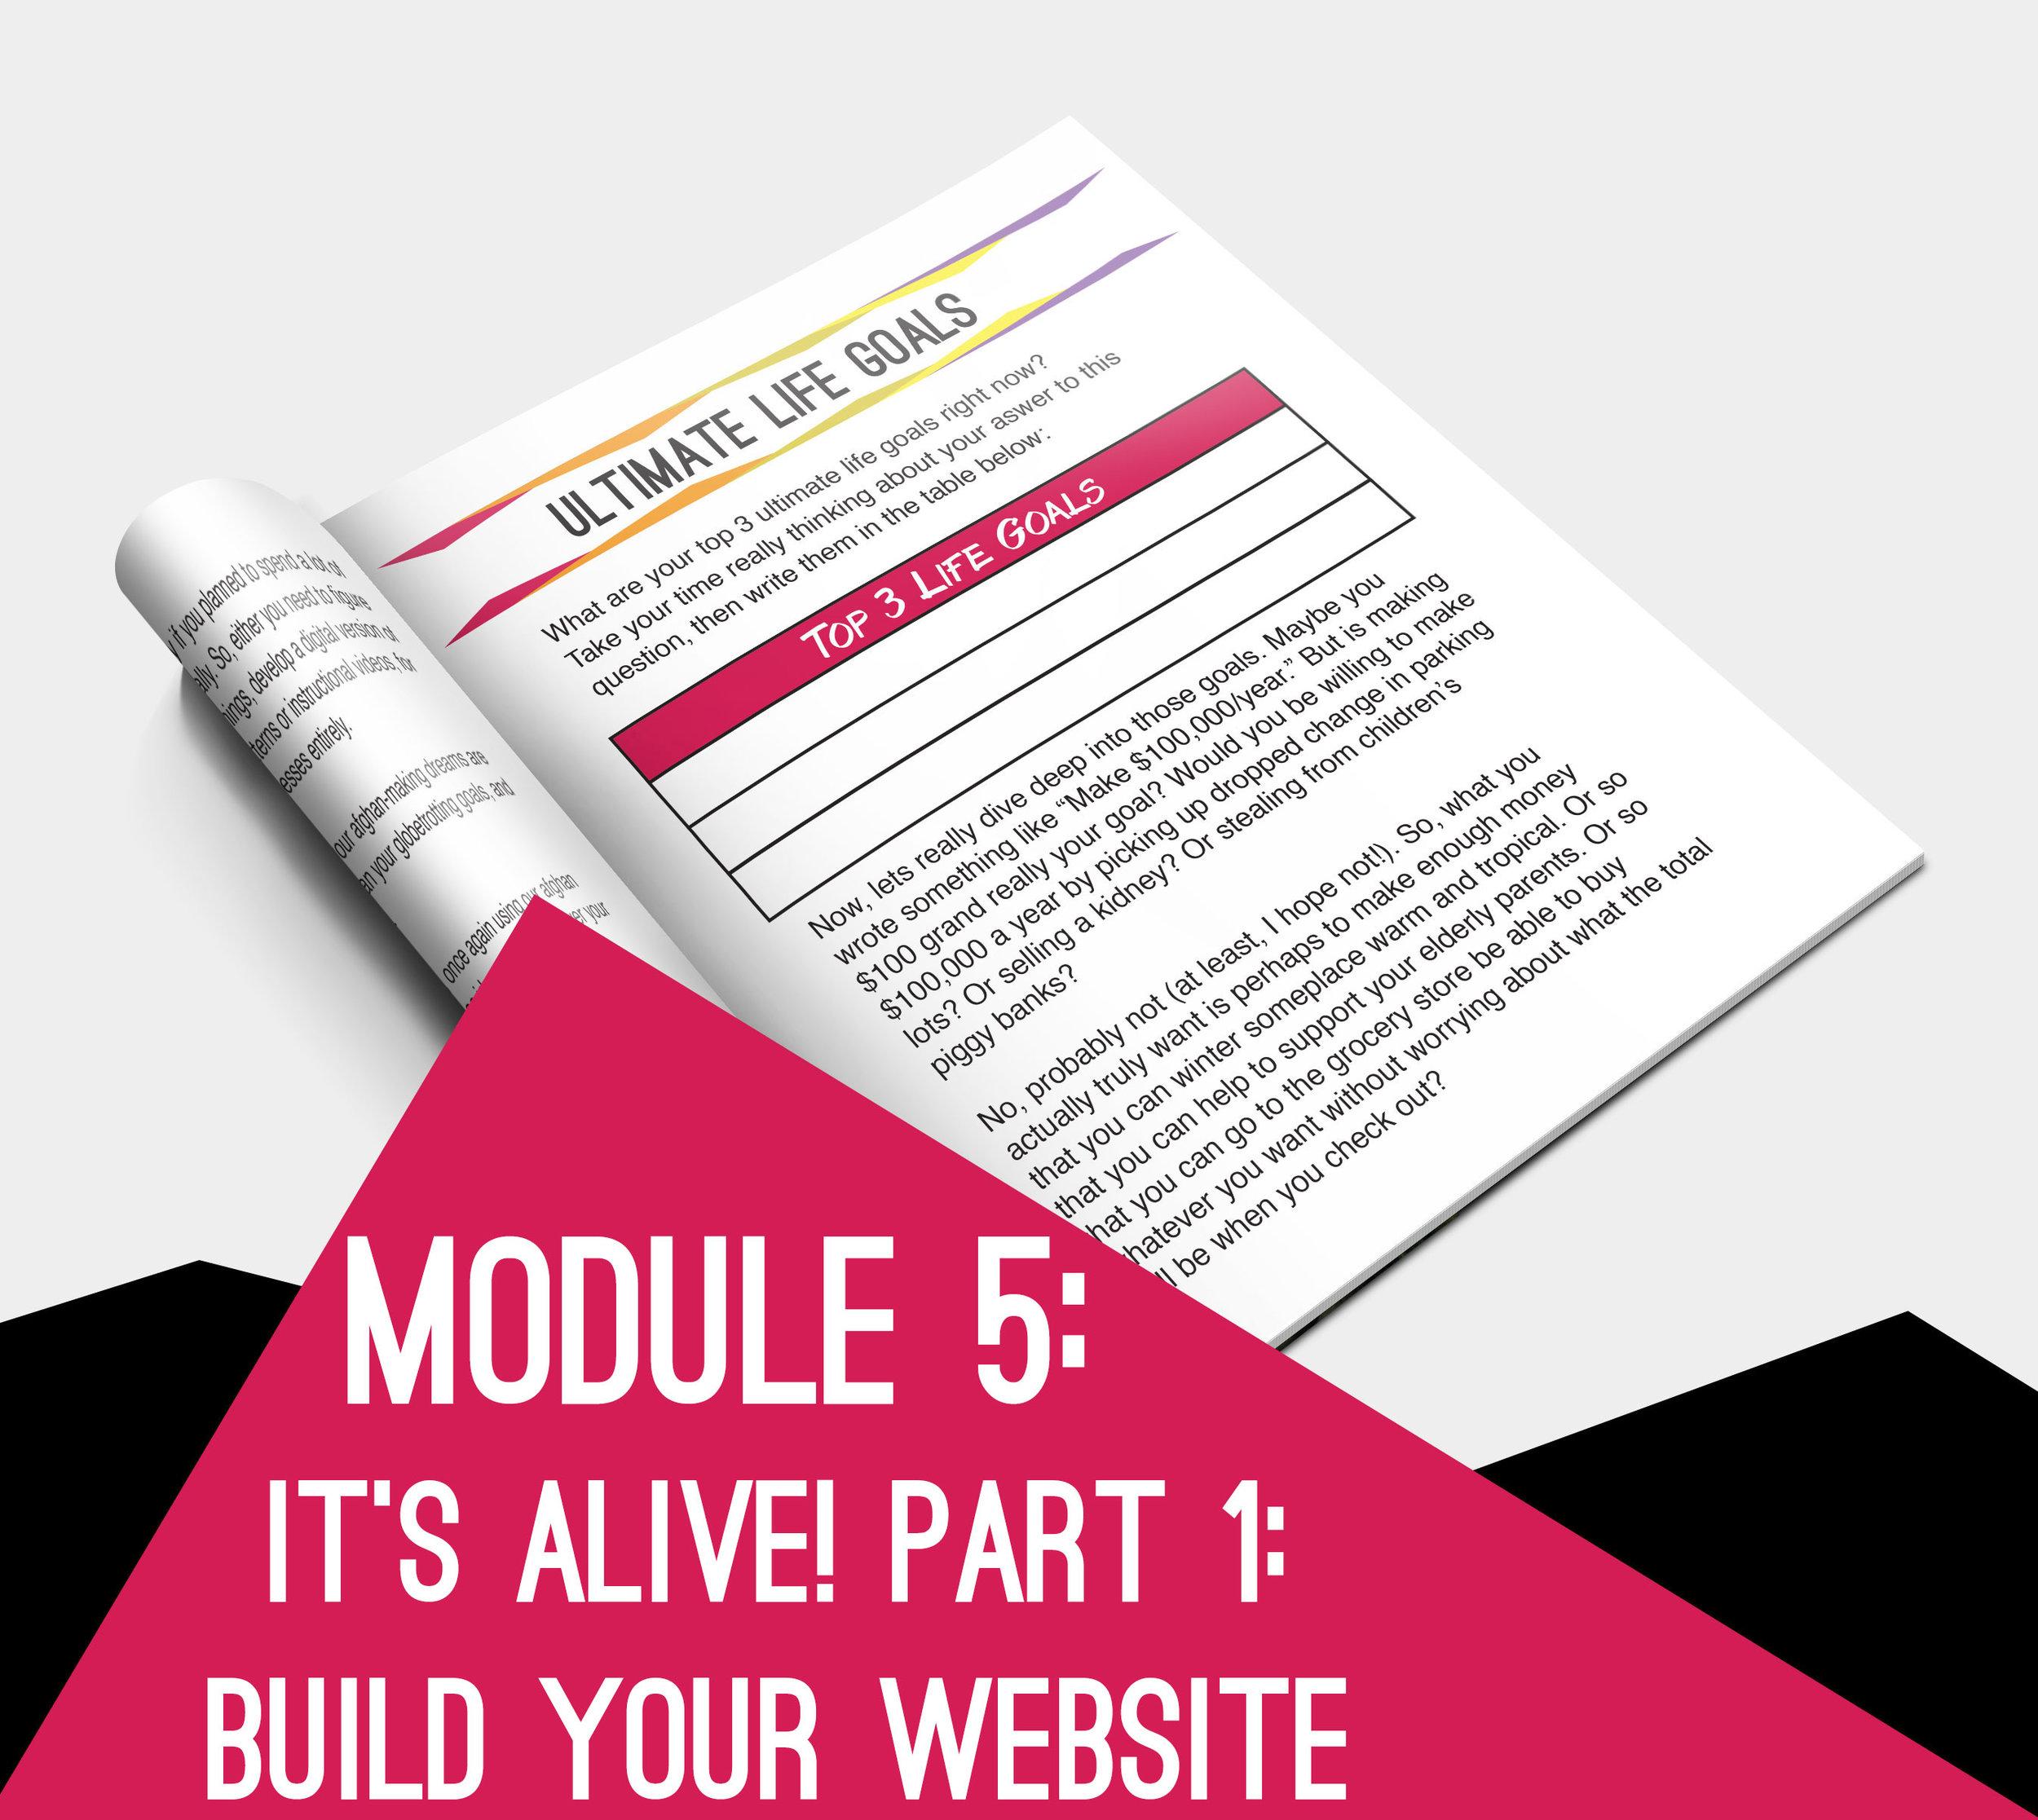 Business-Incubator-Mod-5-website.jpg